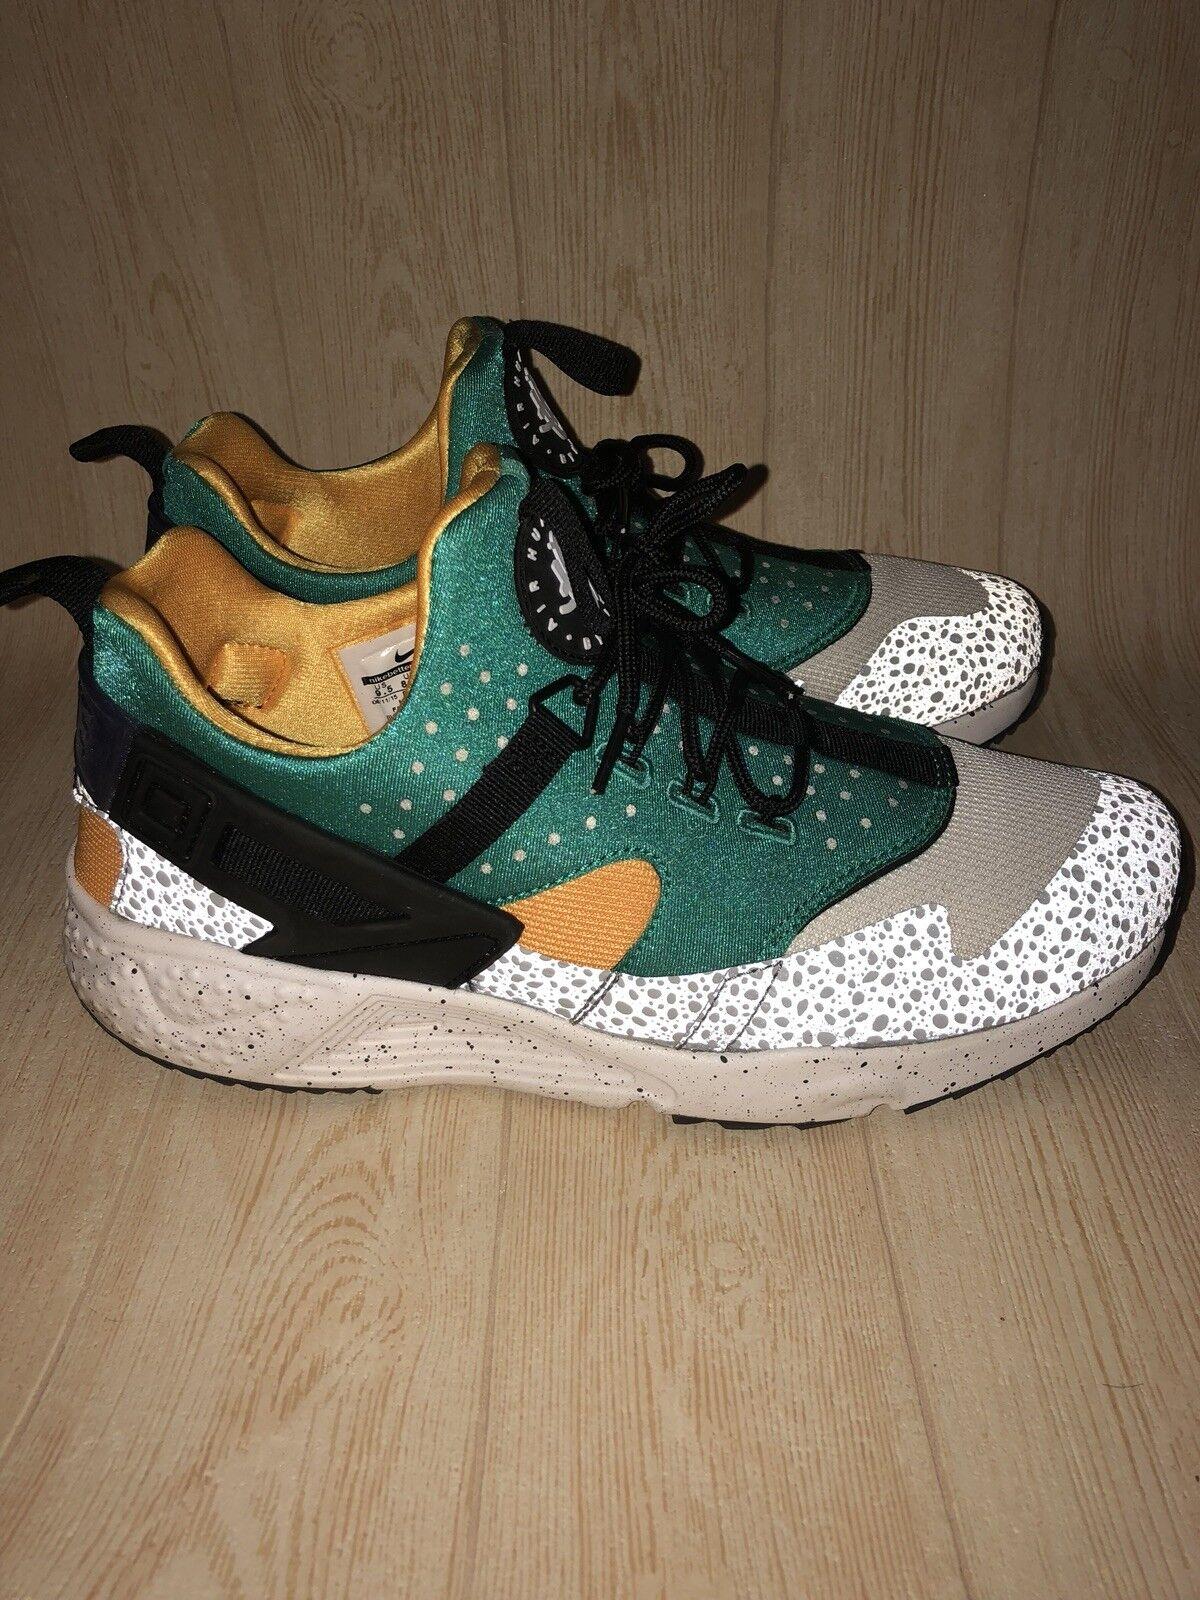 Nike Air Hurache Utility Premium Mens shoes Sz 9.5 Reflective Safari Green